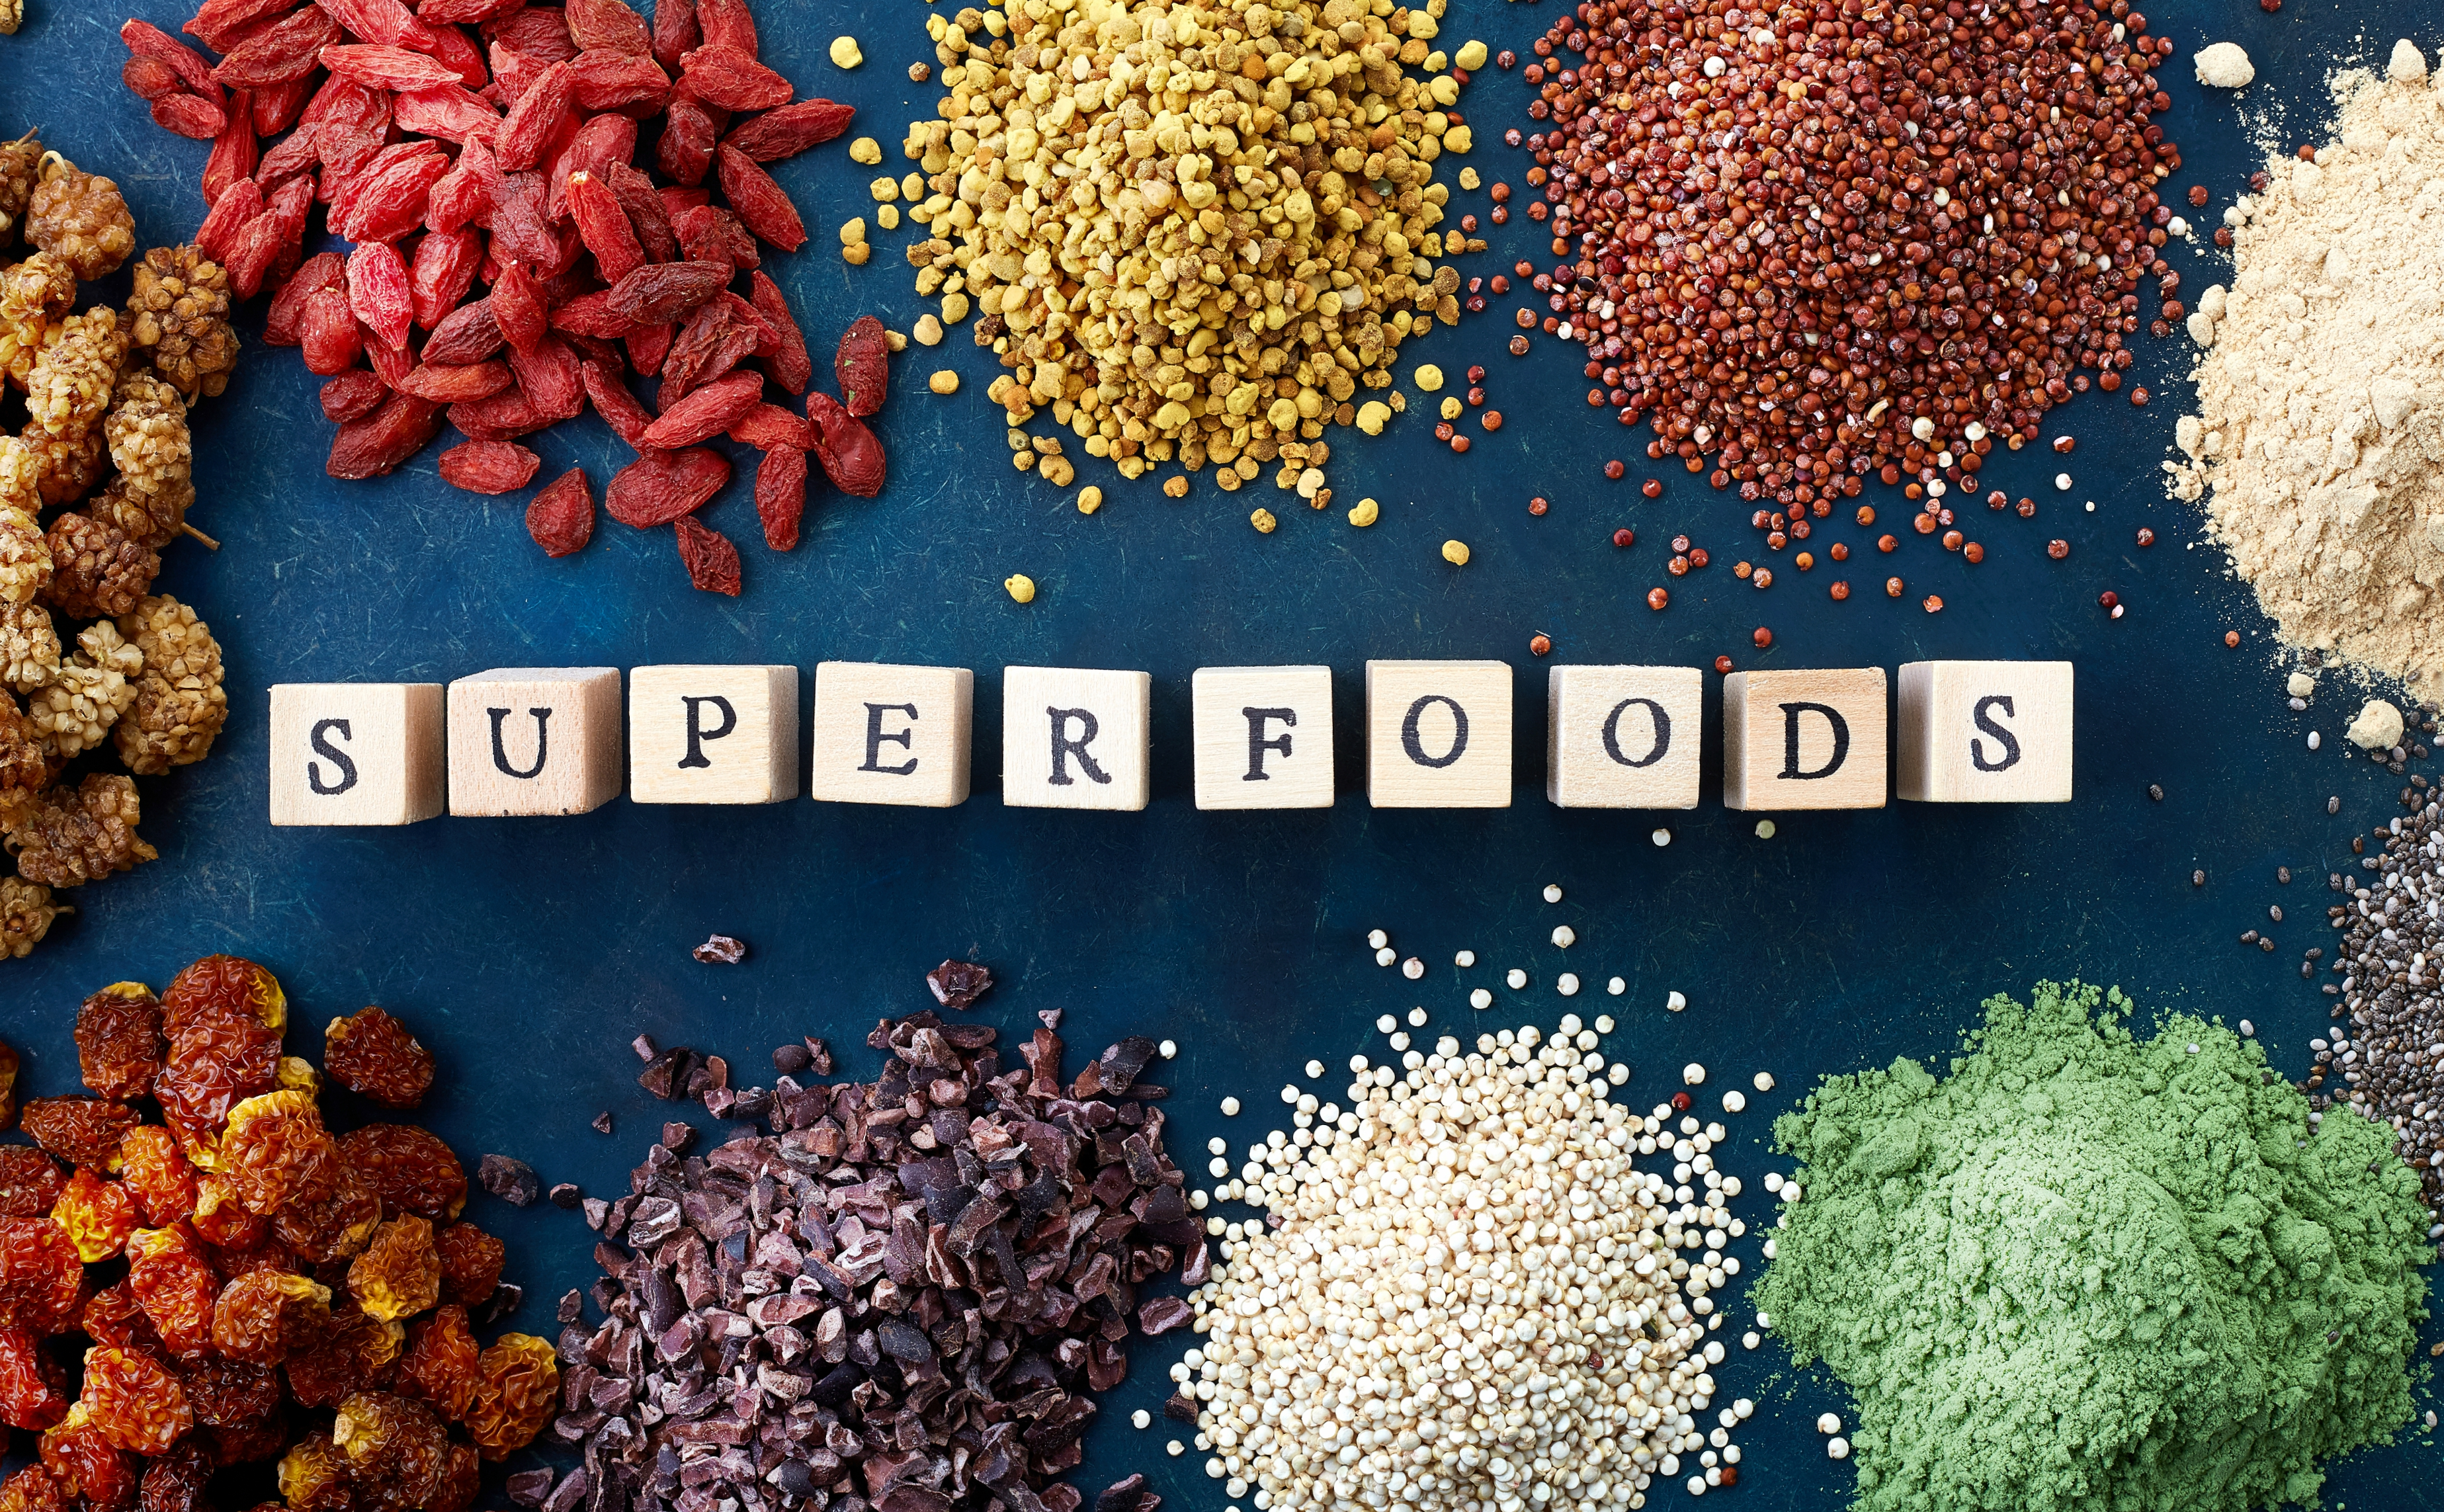 Čo sú to super potraviny alias superfoods?